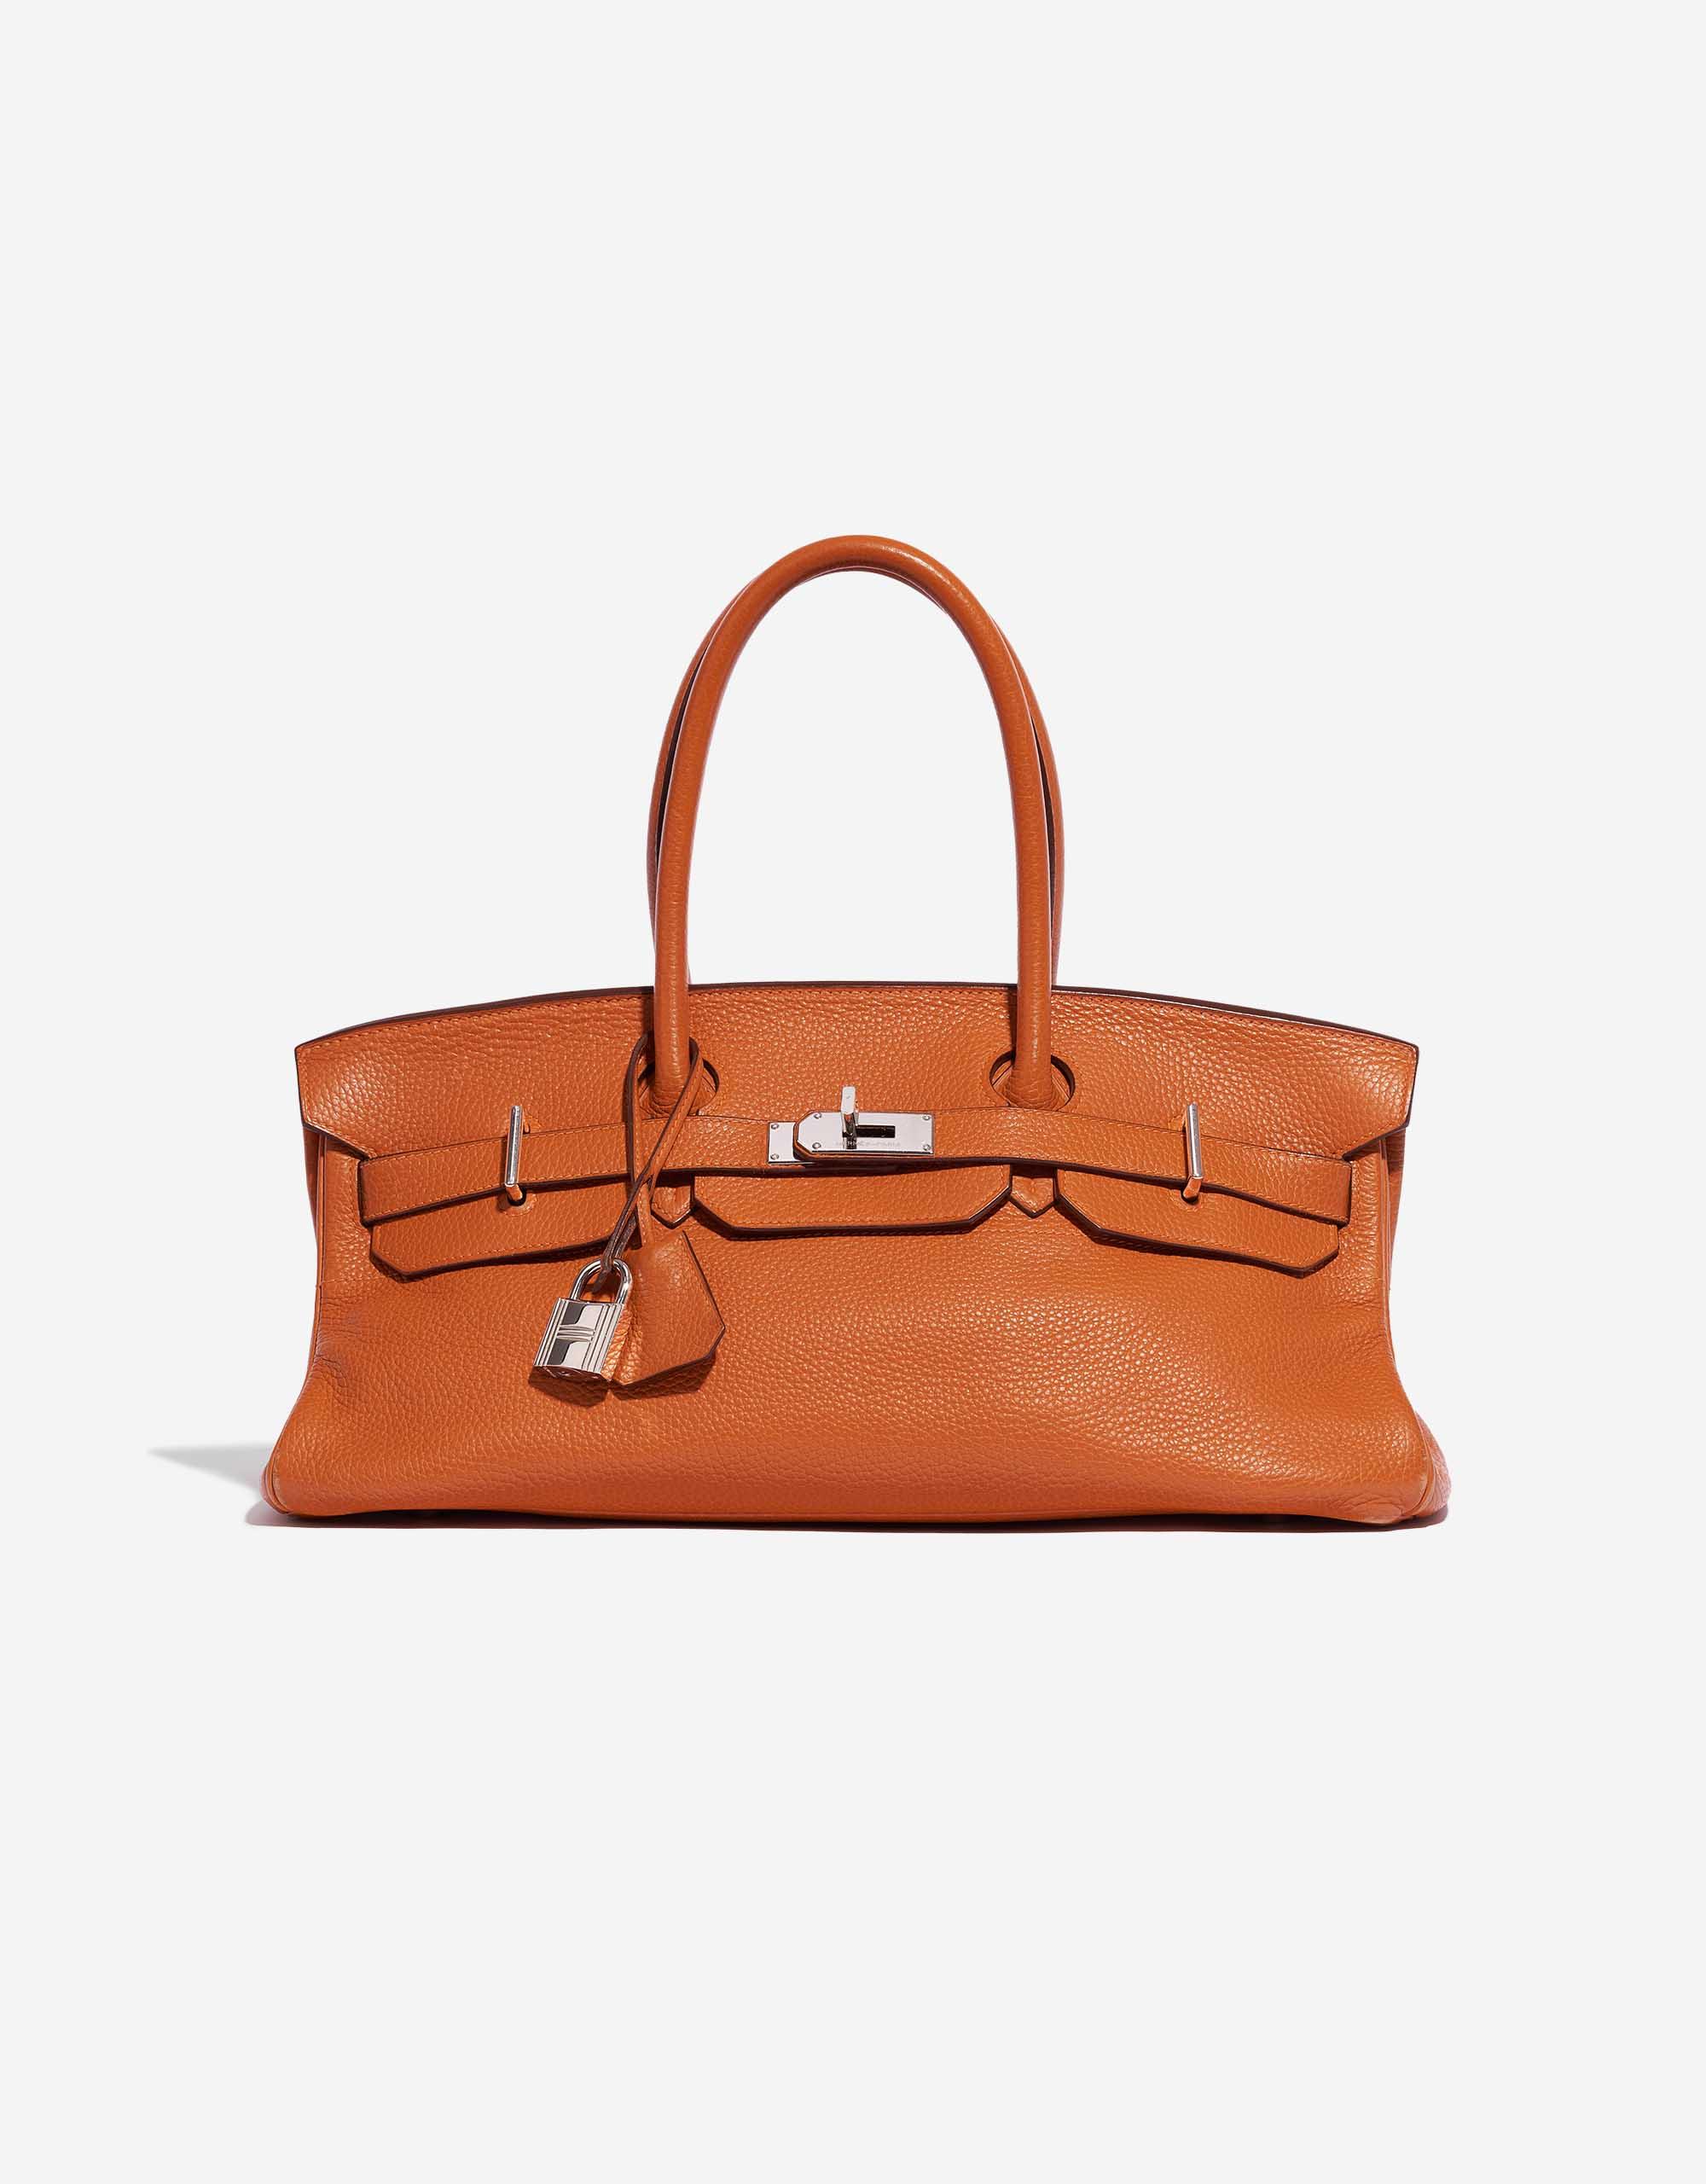 Hermès Birkin JPG Togo Orange | SACLÀB